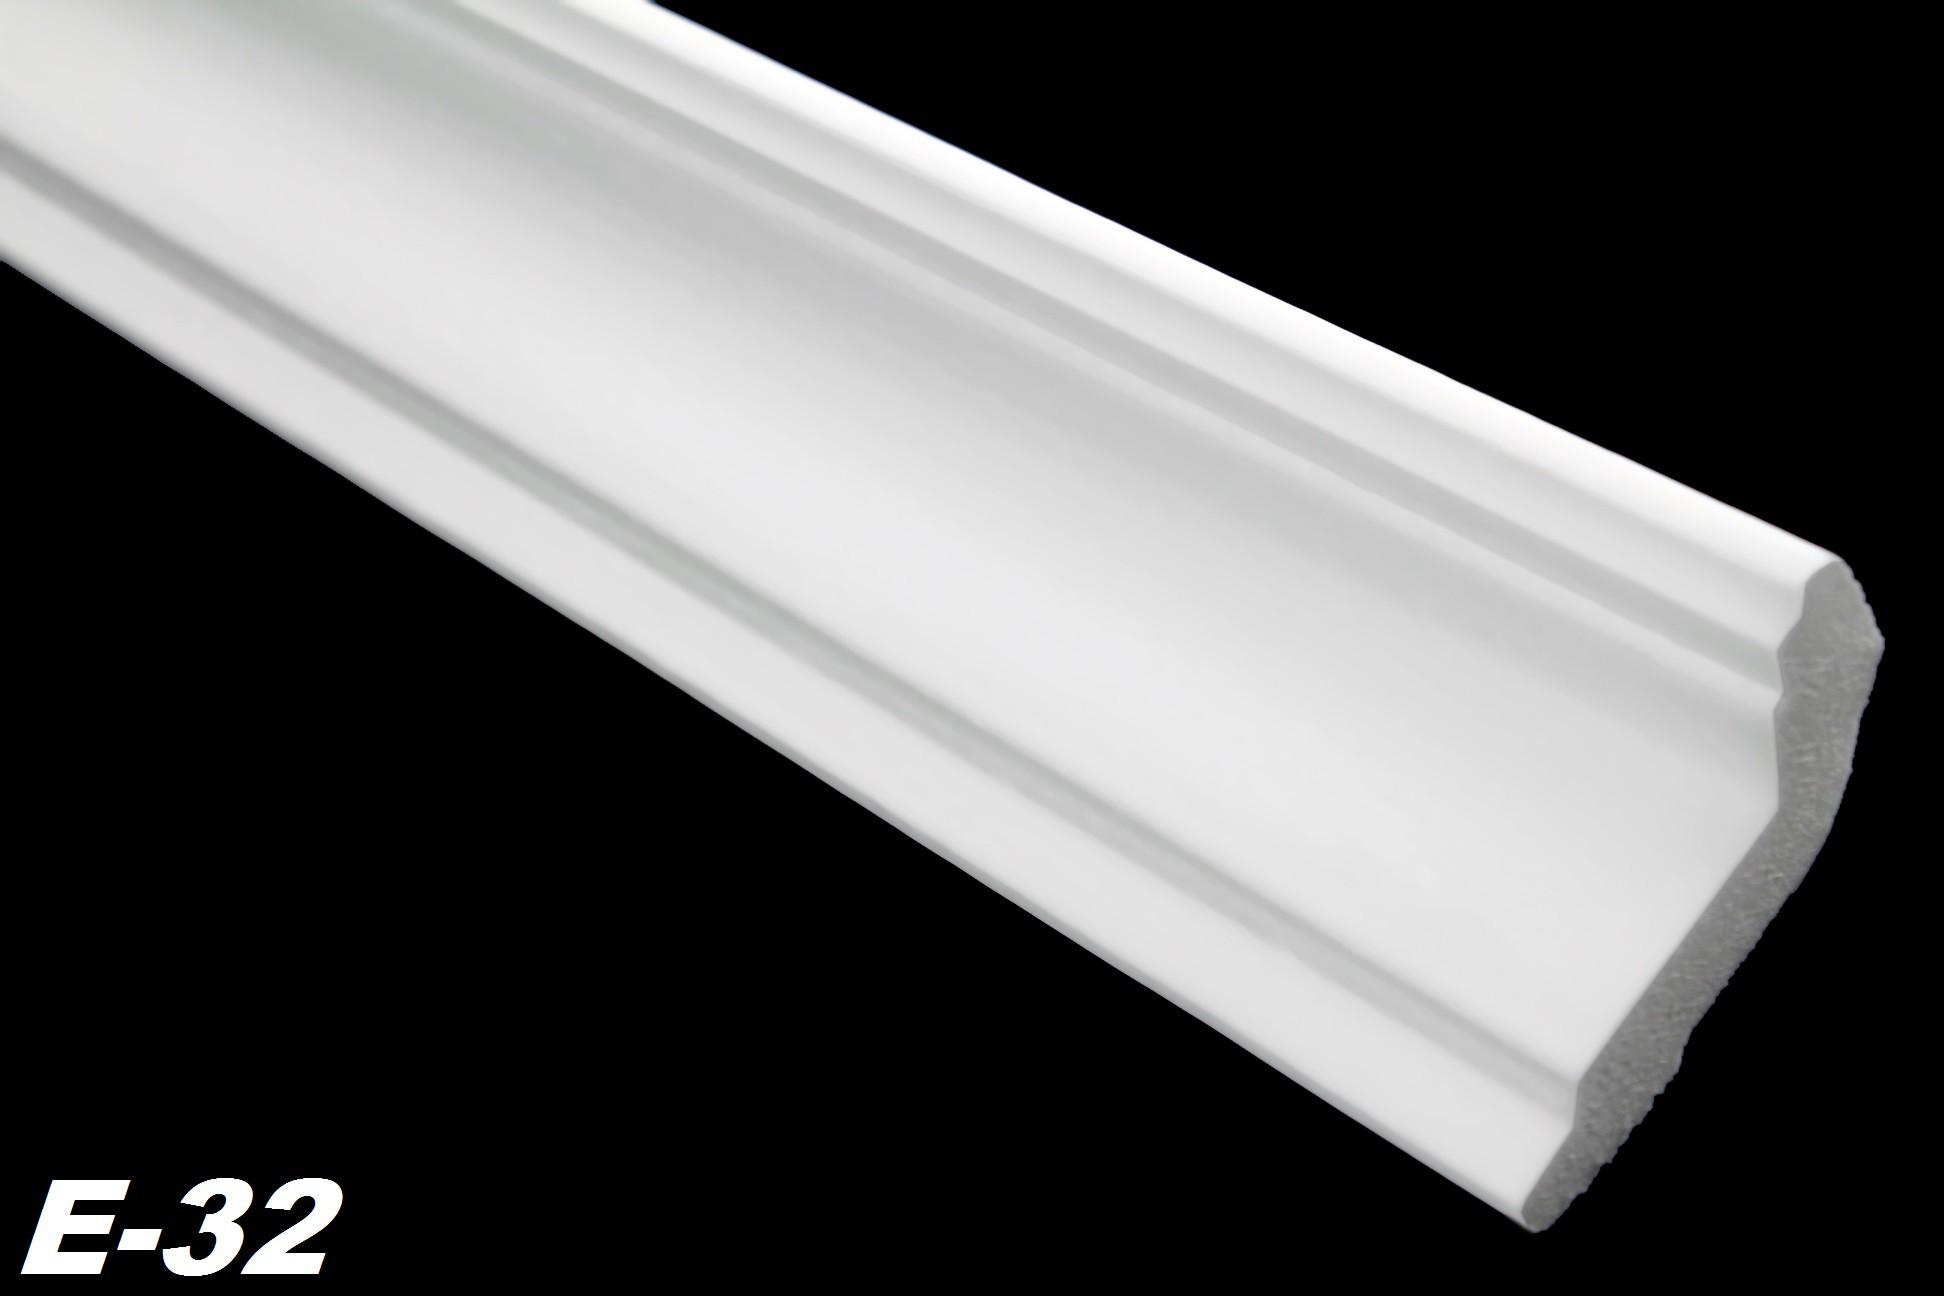 paket] 40 meter + 5 ecken zierprofile eckleisten styropor stuck hart